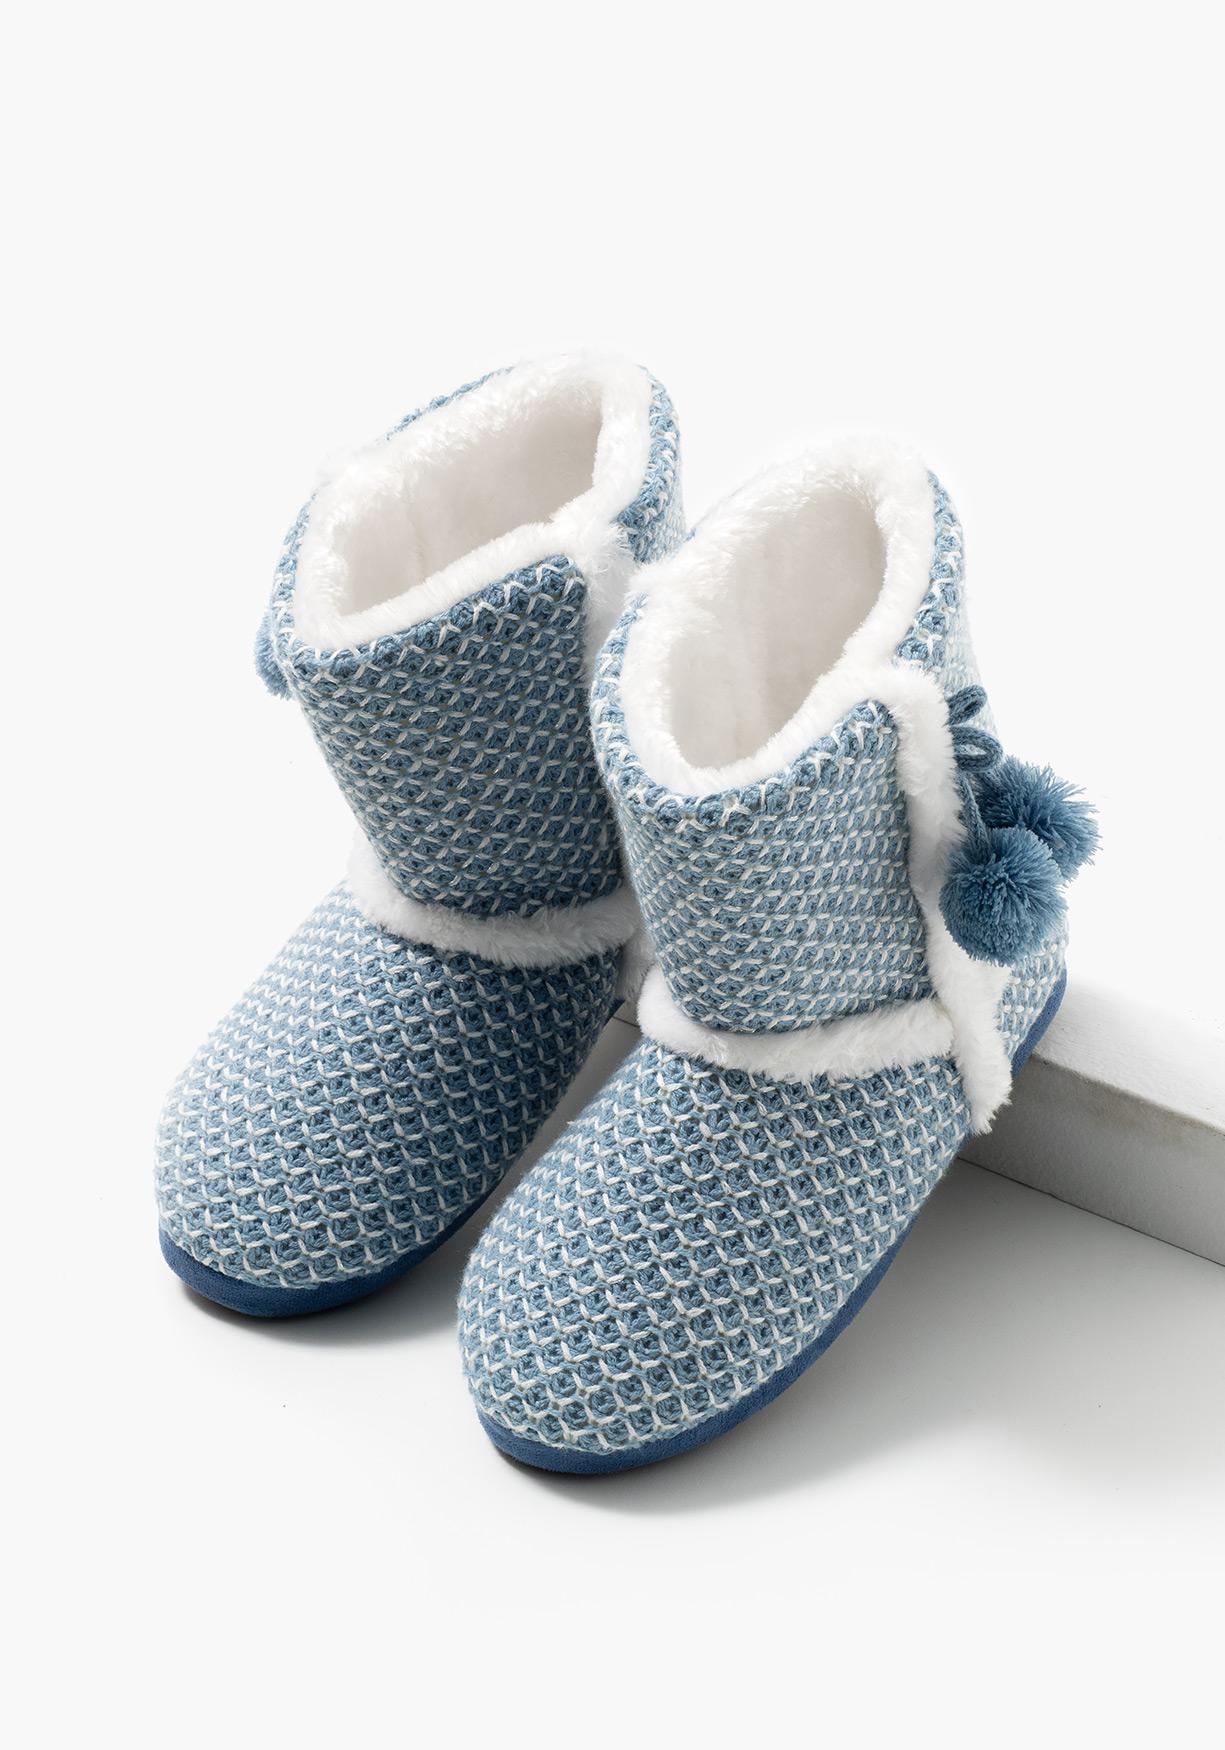 61870b89057 Comprar Zapatillas de estar por casa tipo bota TEX. ¡Aprovéchate de ...